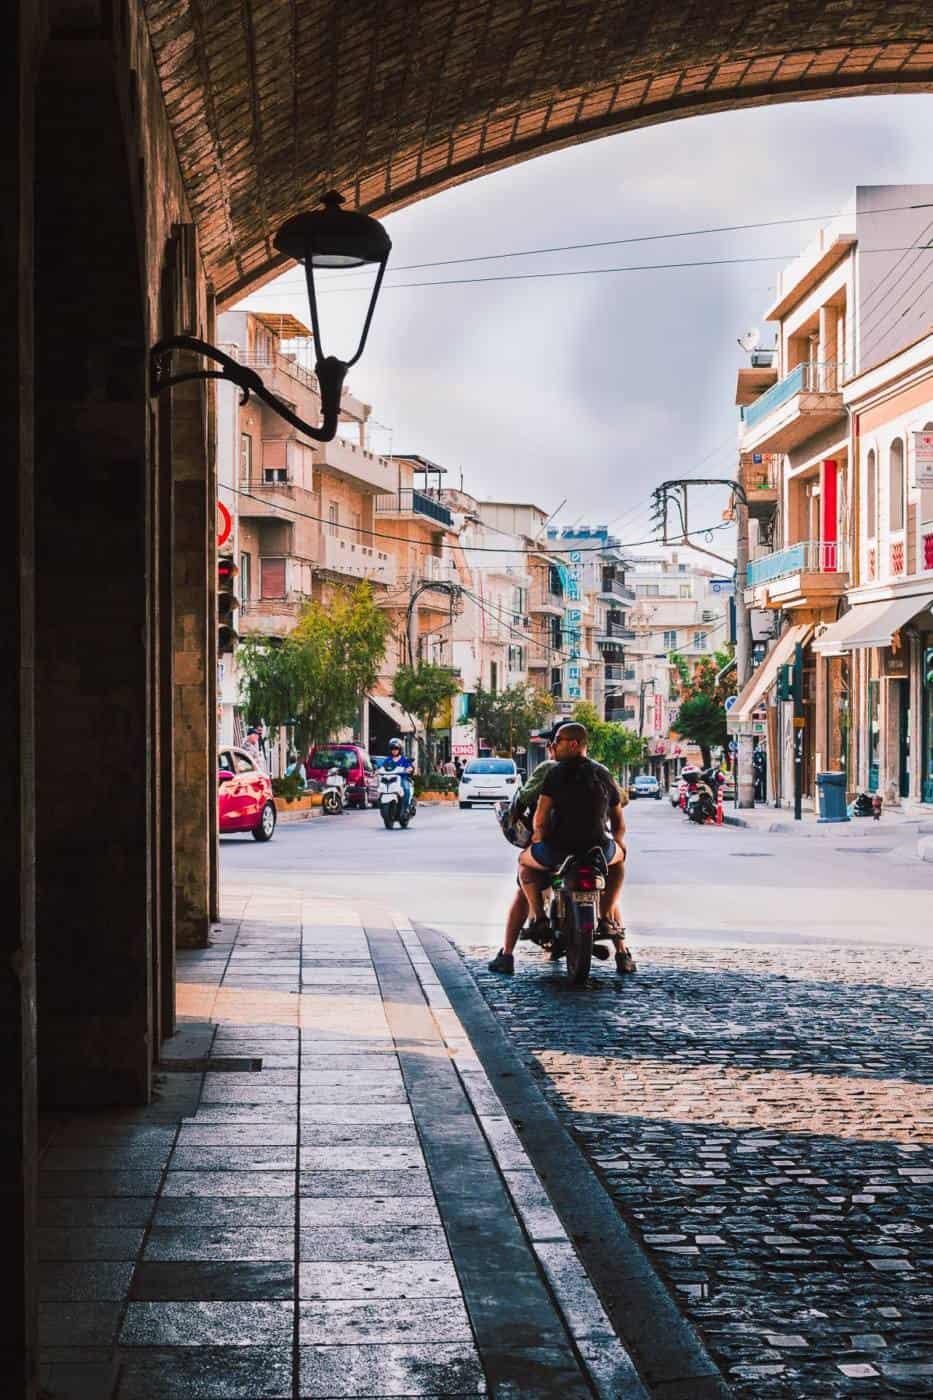 Scooter in Crete Greece